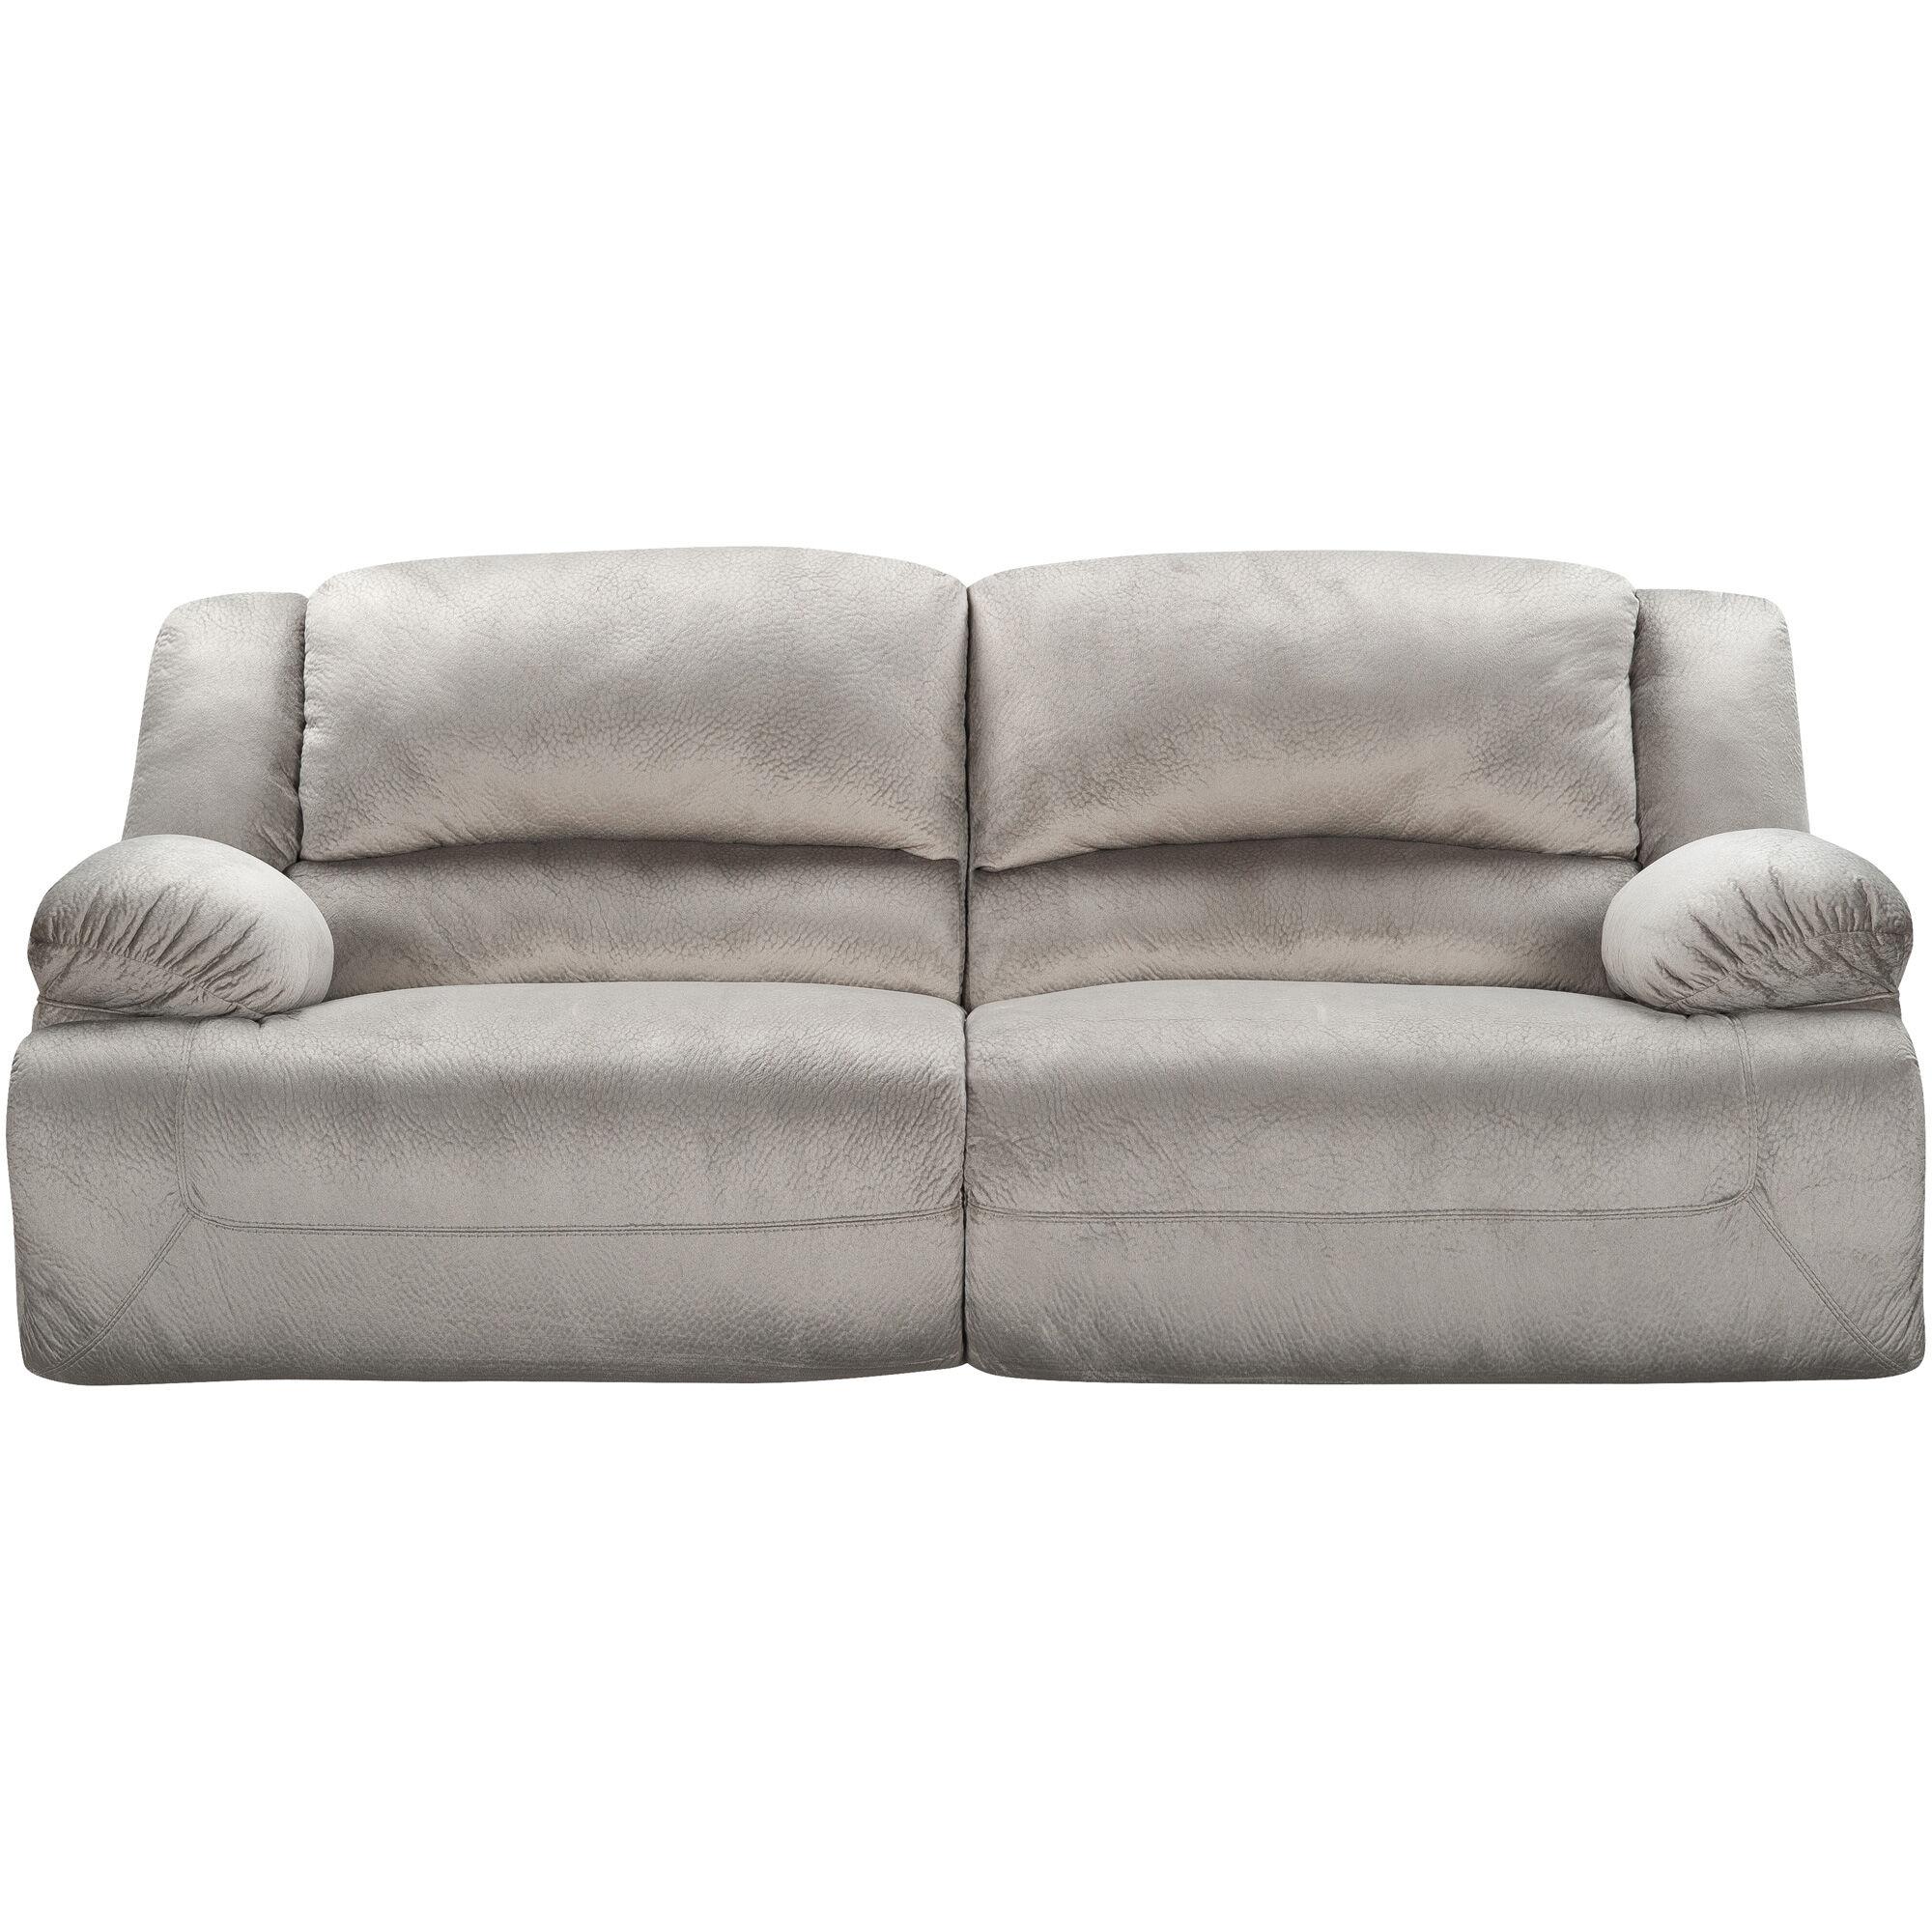 Winston Granite Reclining Sofa; Winston Granite Reclining Sofa ...